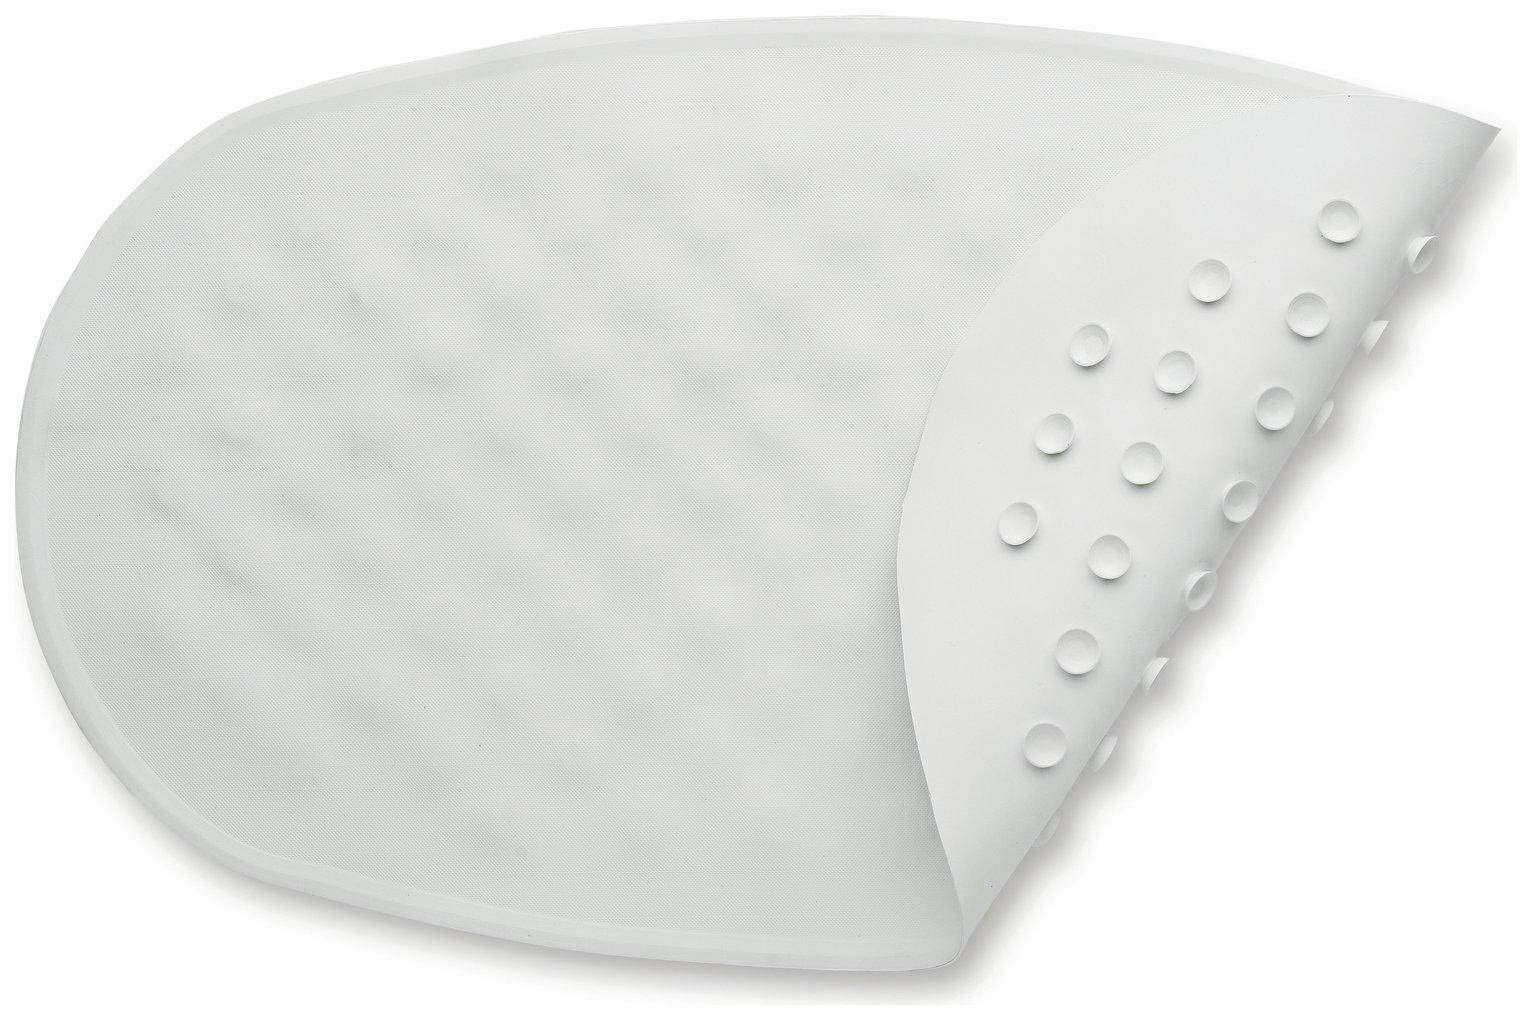 Image of BabyDan - Bath Mat Oval